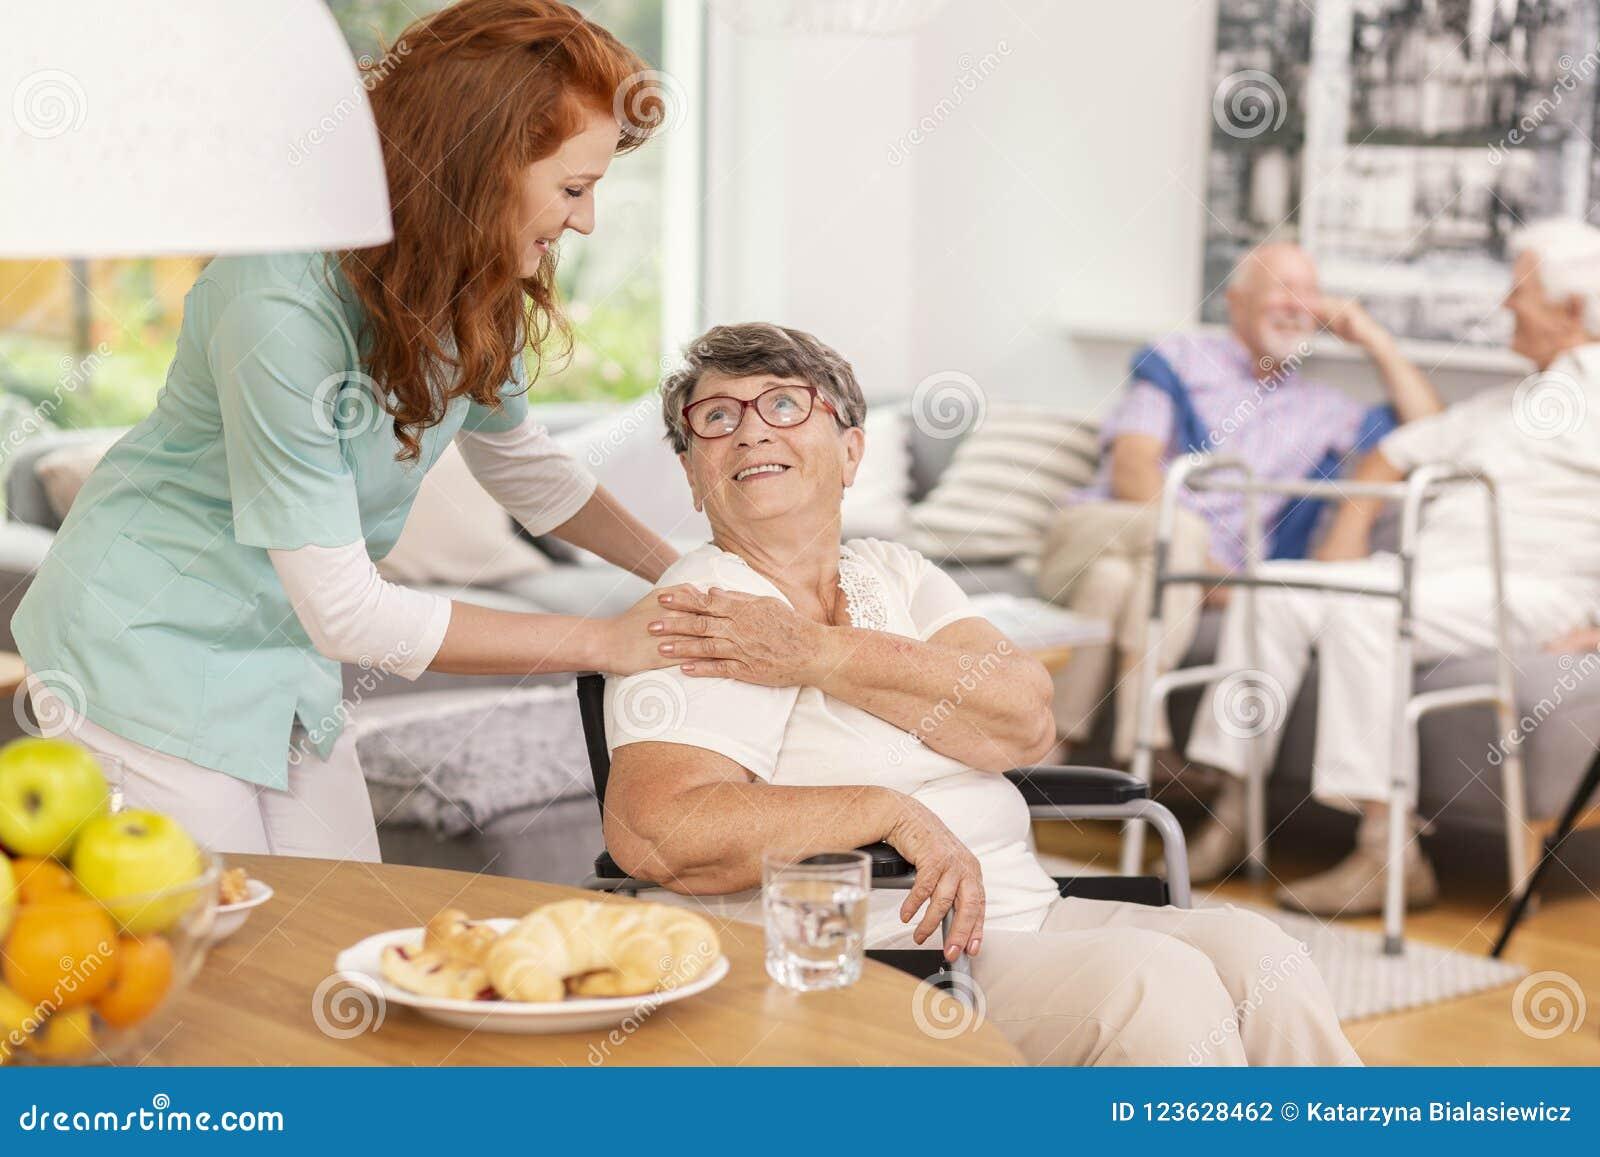 Friendly nurse supporting smiling senior woman in nursing house.